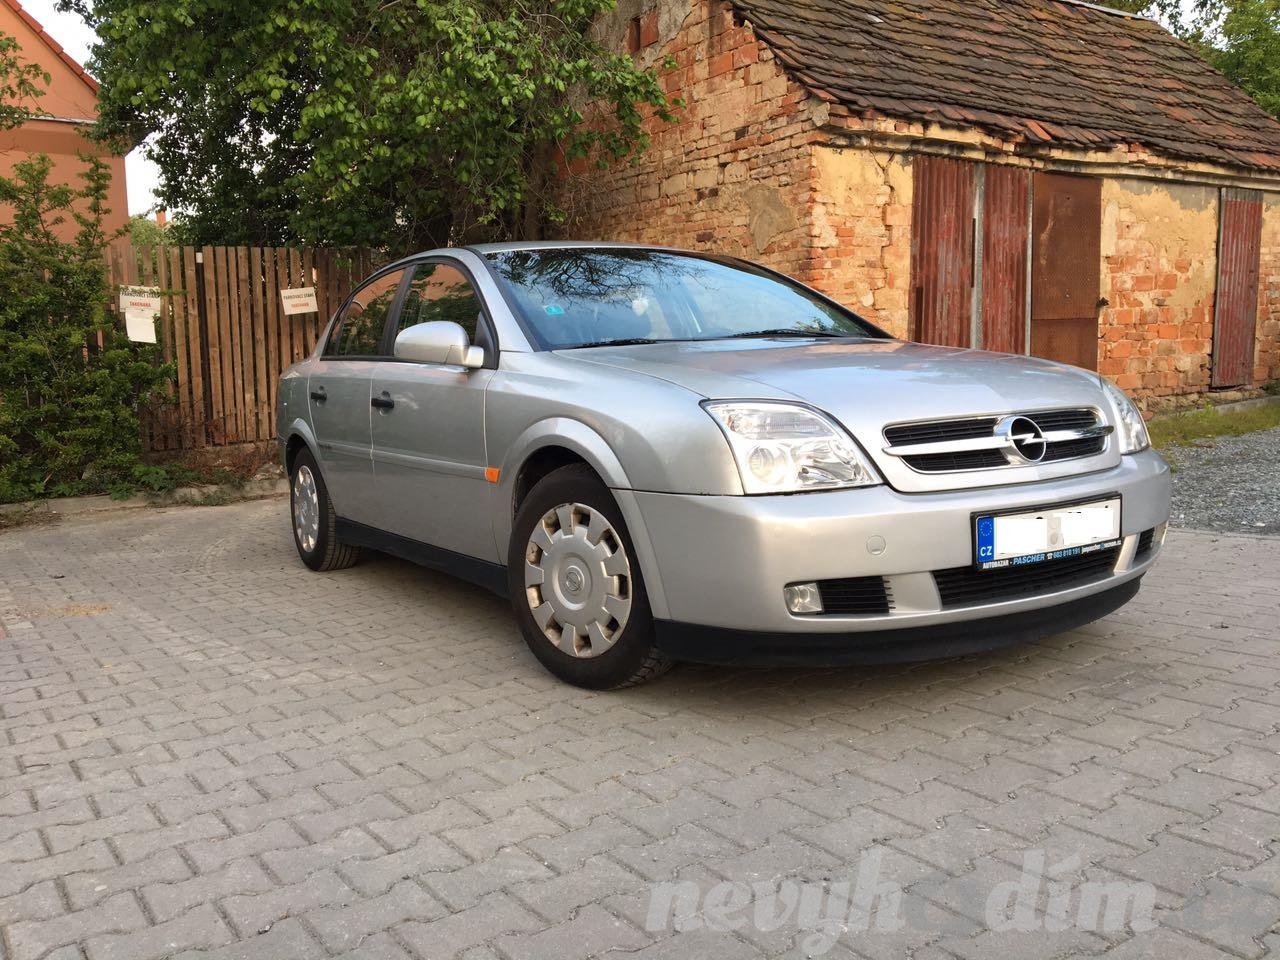 978c1dfb4 Opel vectra 1.8. 90kw - 144 000km - Serv. kniha | Online inzerce ...